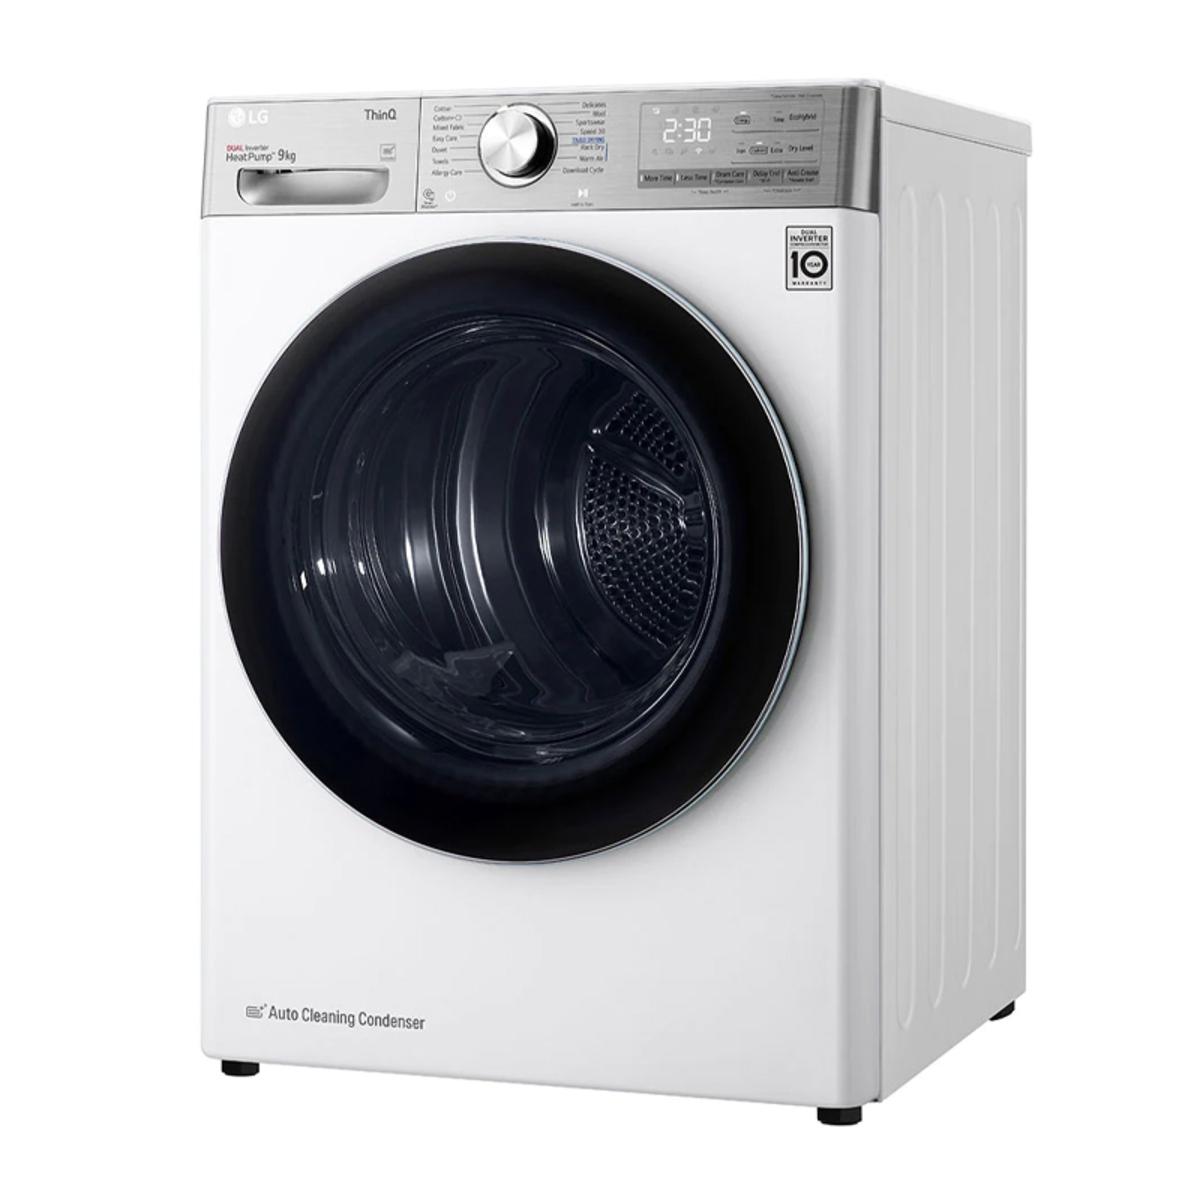 LG FDV1109W 9Kg Eco Hybrid Heat Pump Tumble Dryer, White